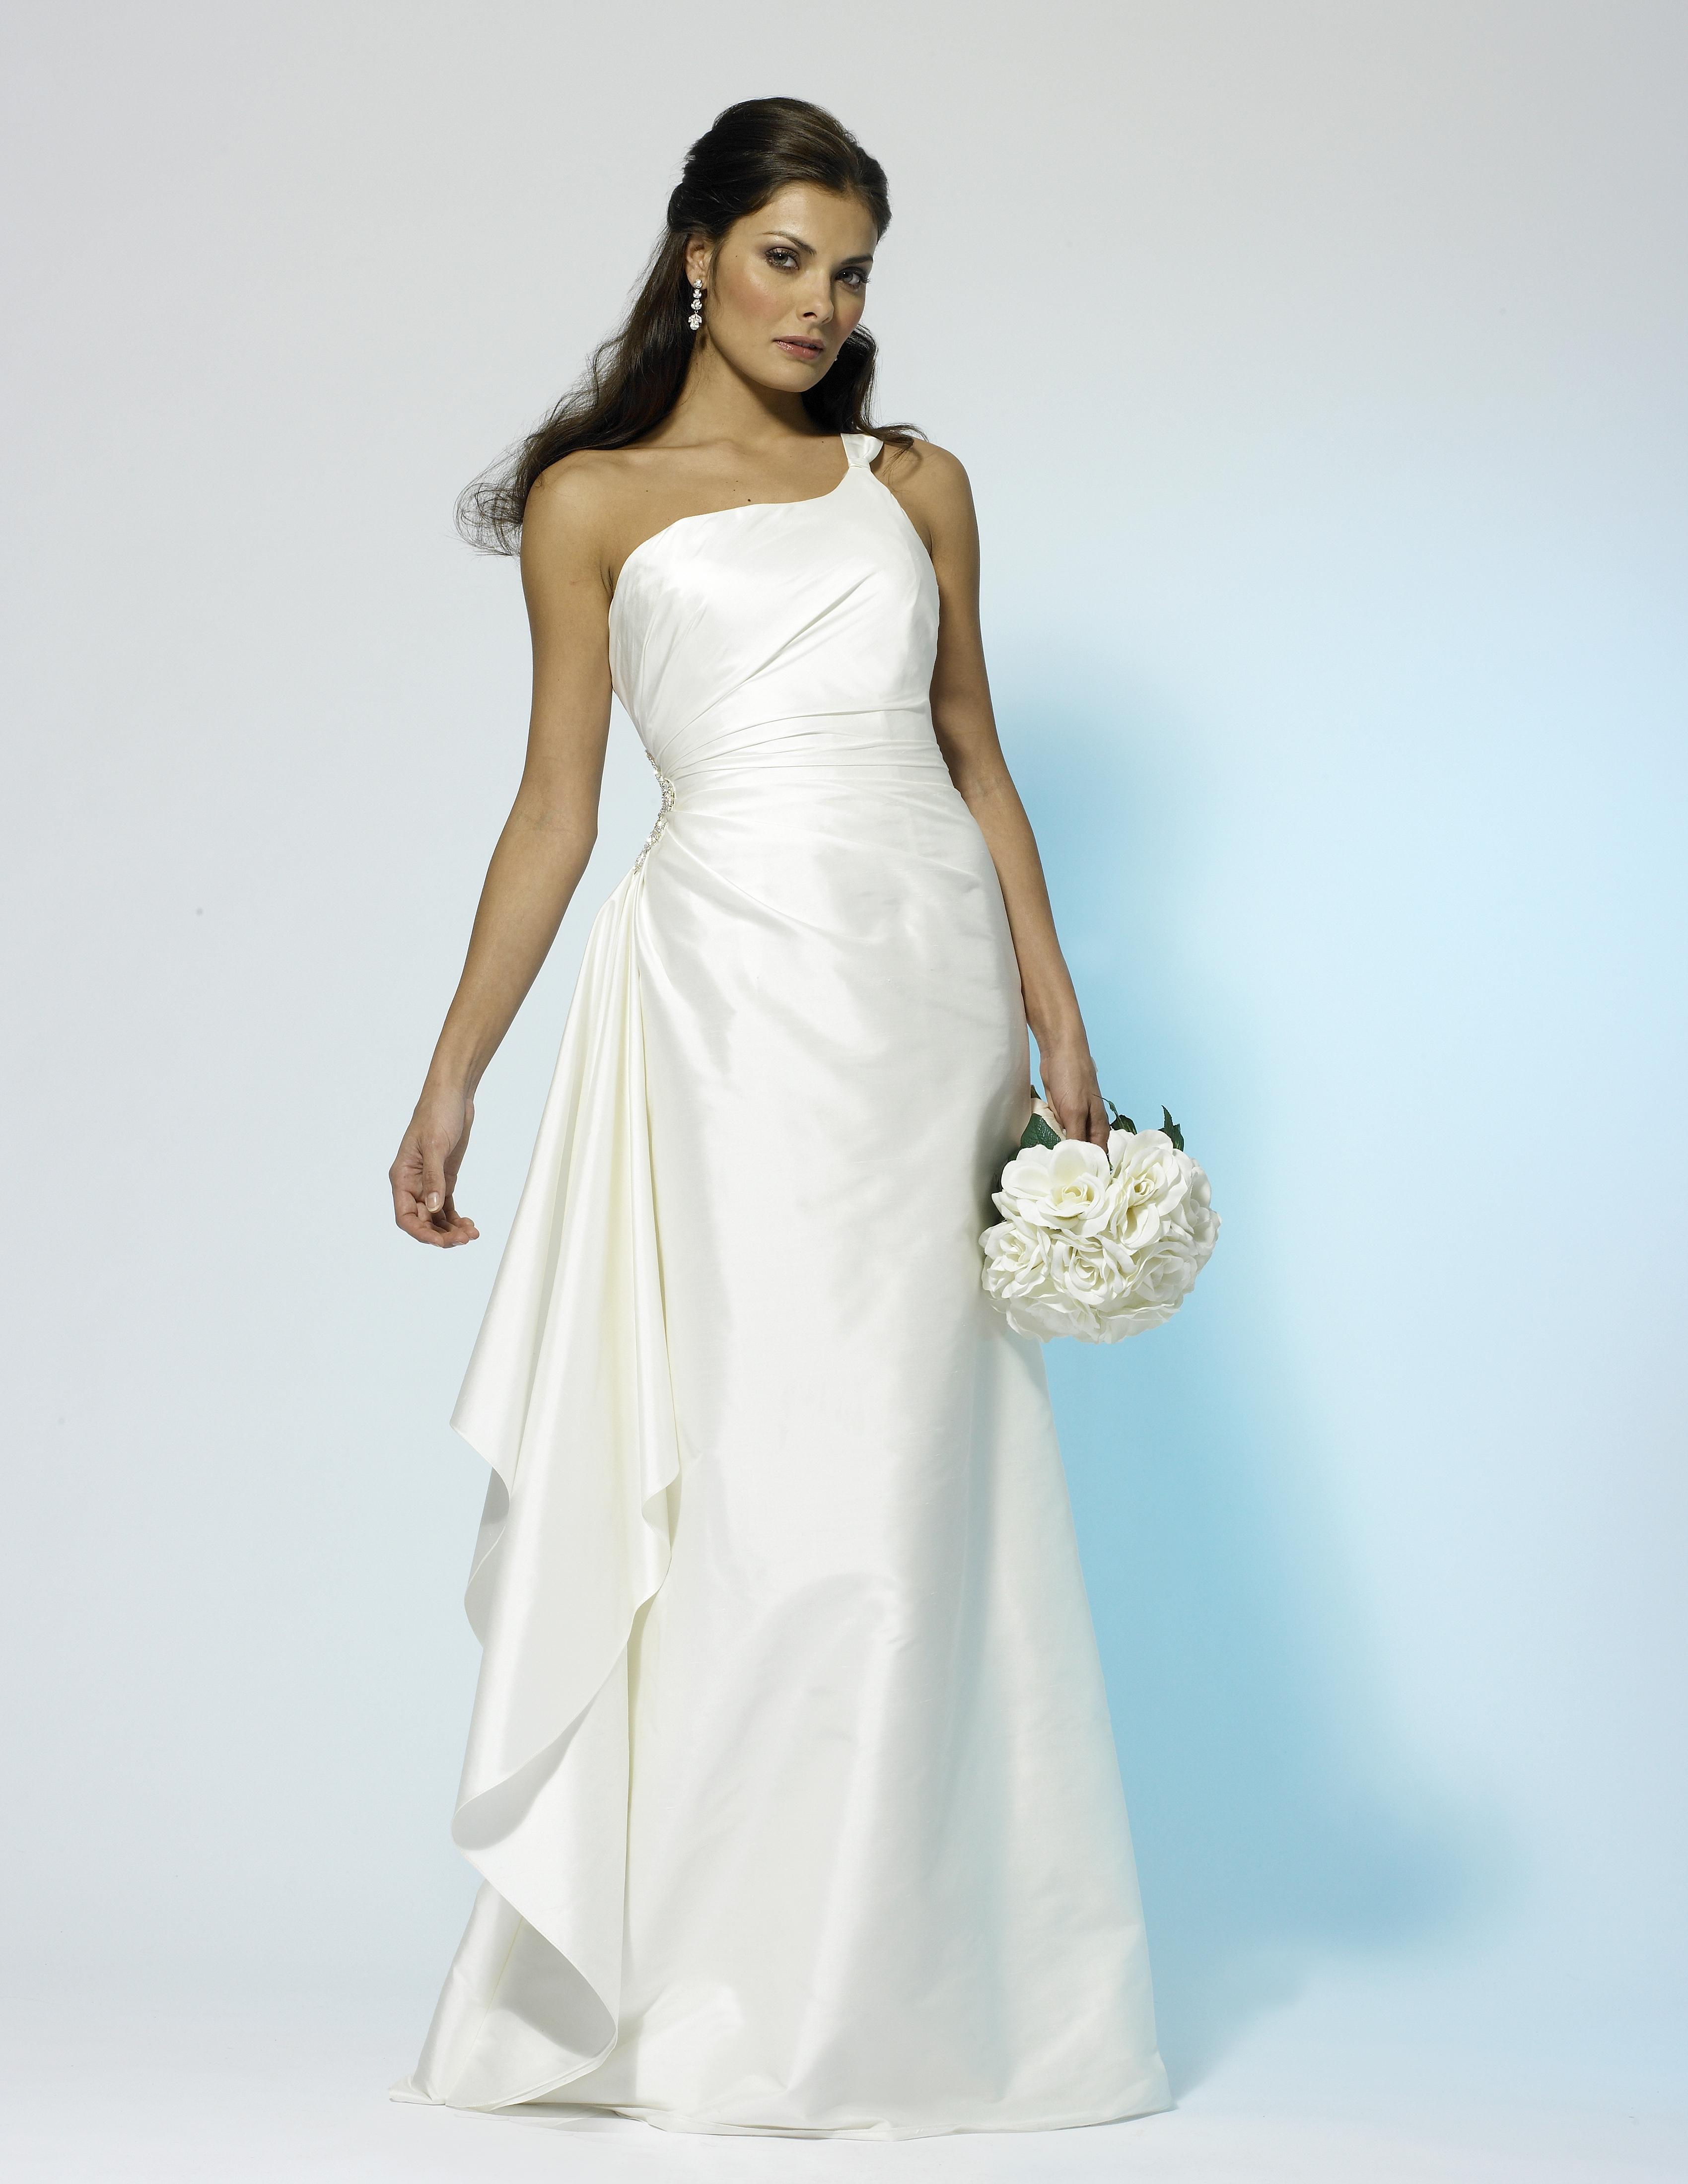 Wedding Dresses, Fashion, dress, Ali b maids